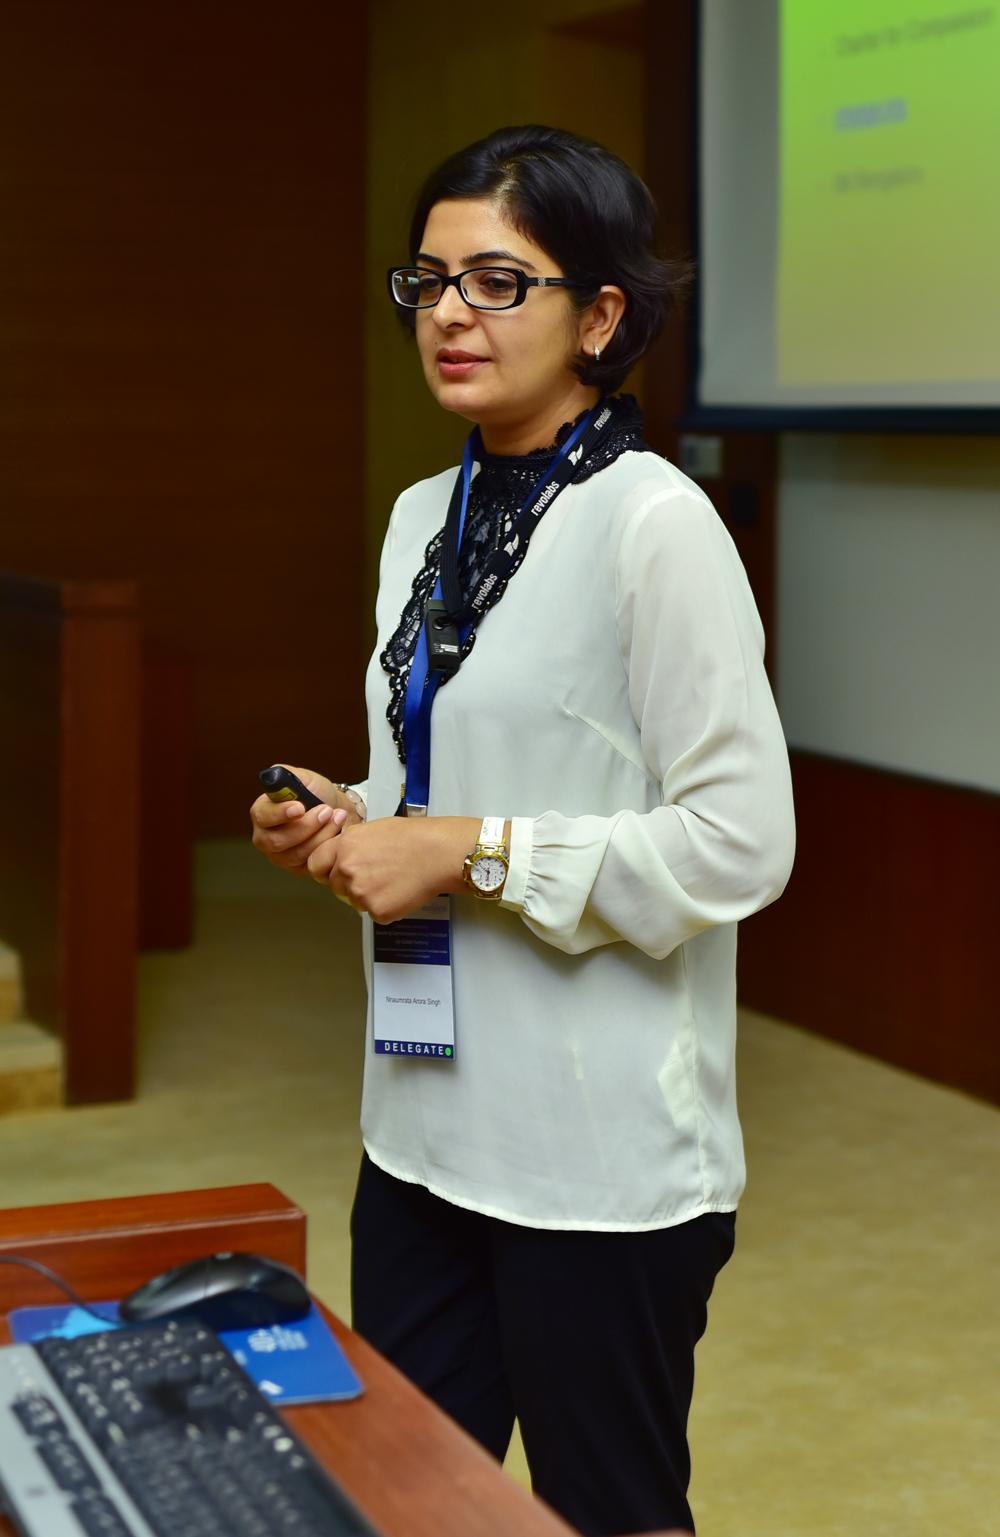 Nnaumrata Arora Singh